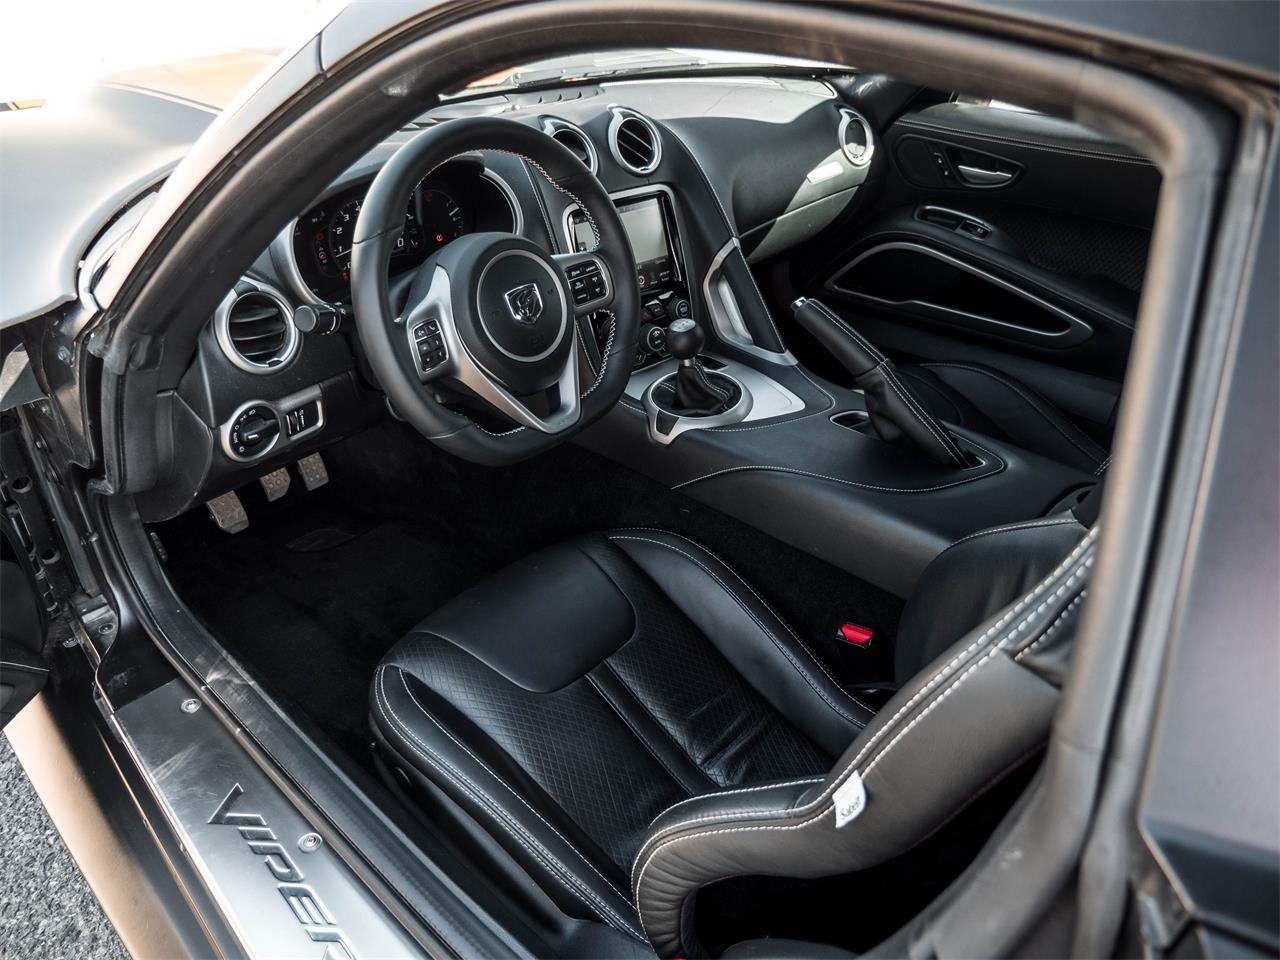 2014 Dodge Viper (CC-1380046) for sale in Kelowna, British Columbia